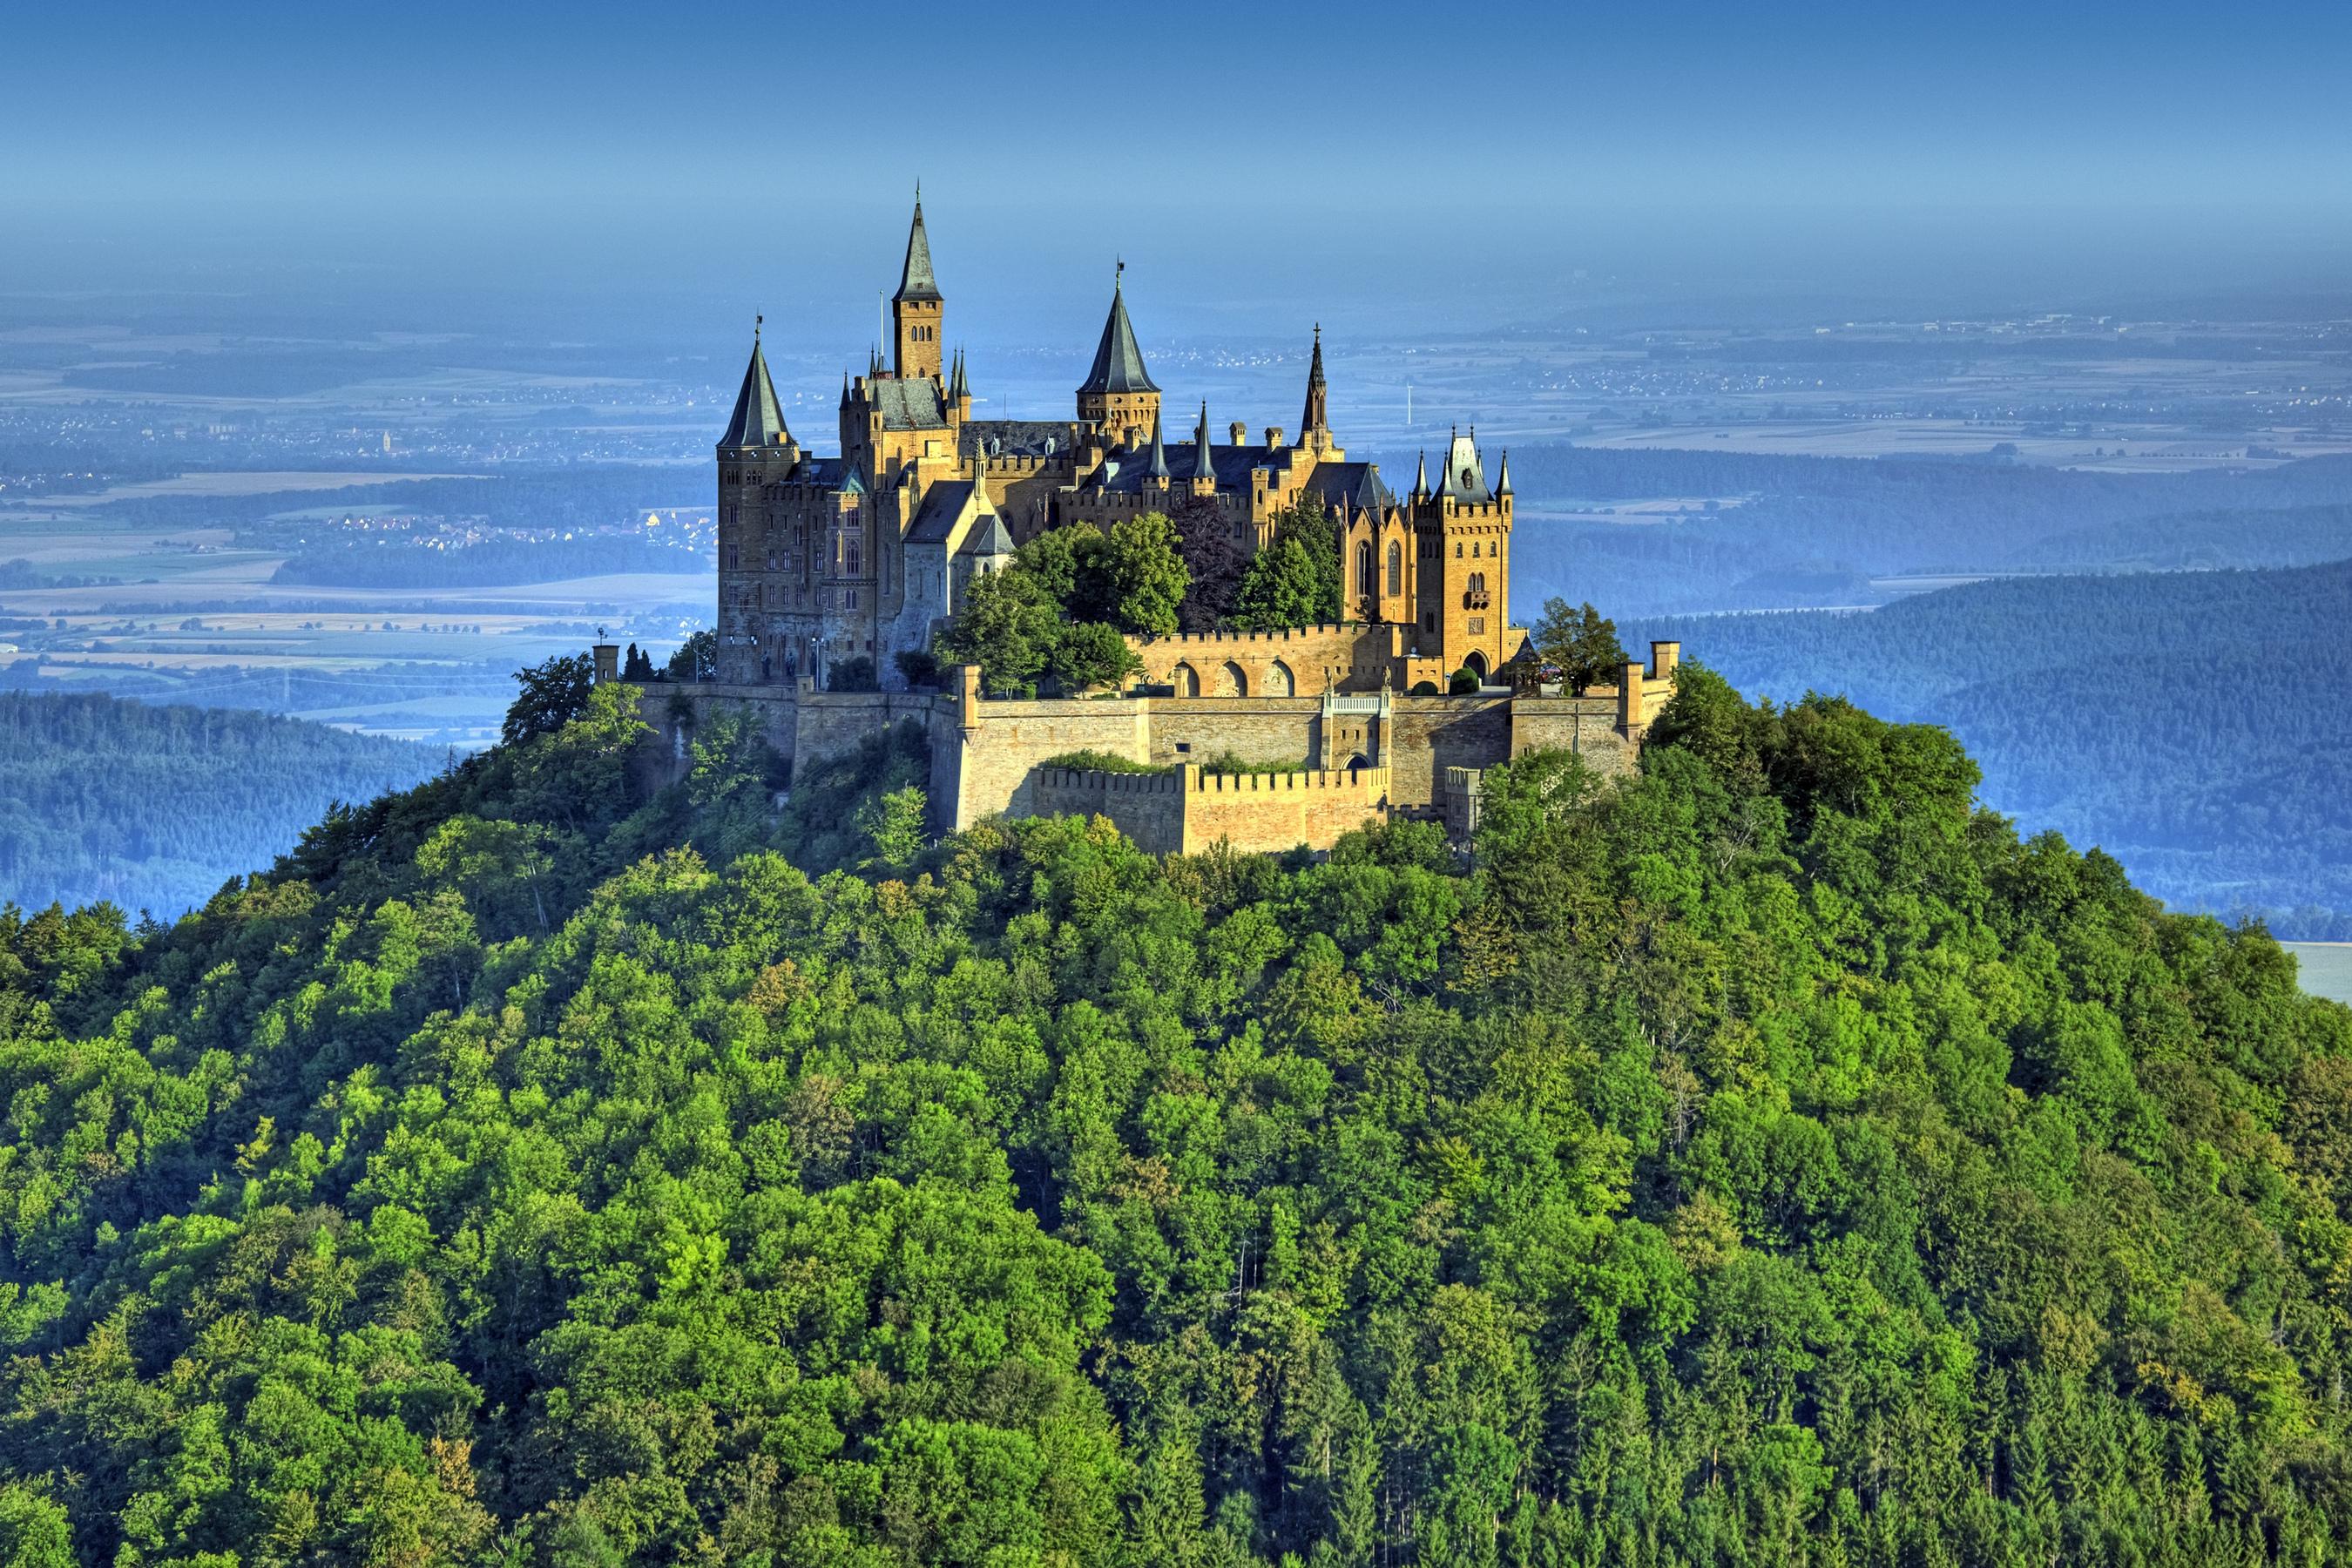 Hohenzollern Castle Germany Wallpaper Gallery Yopriceville 2700x1800